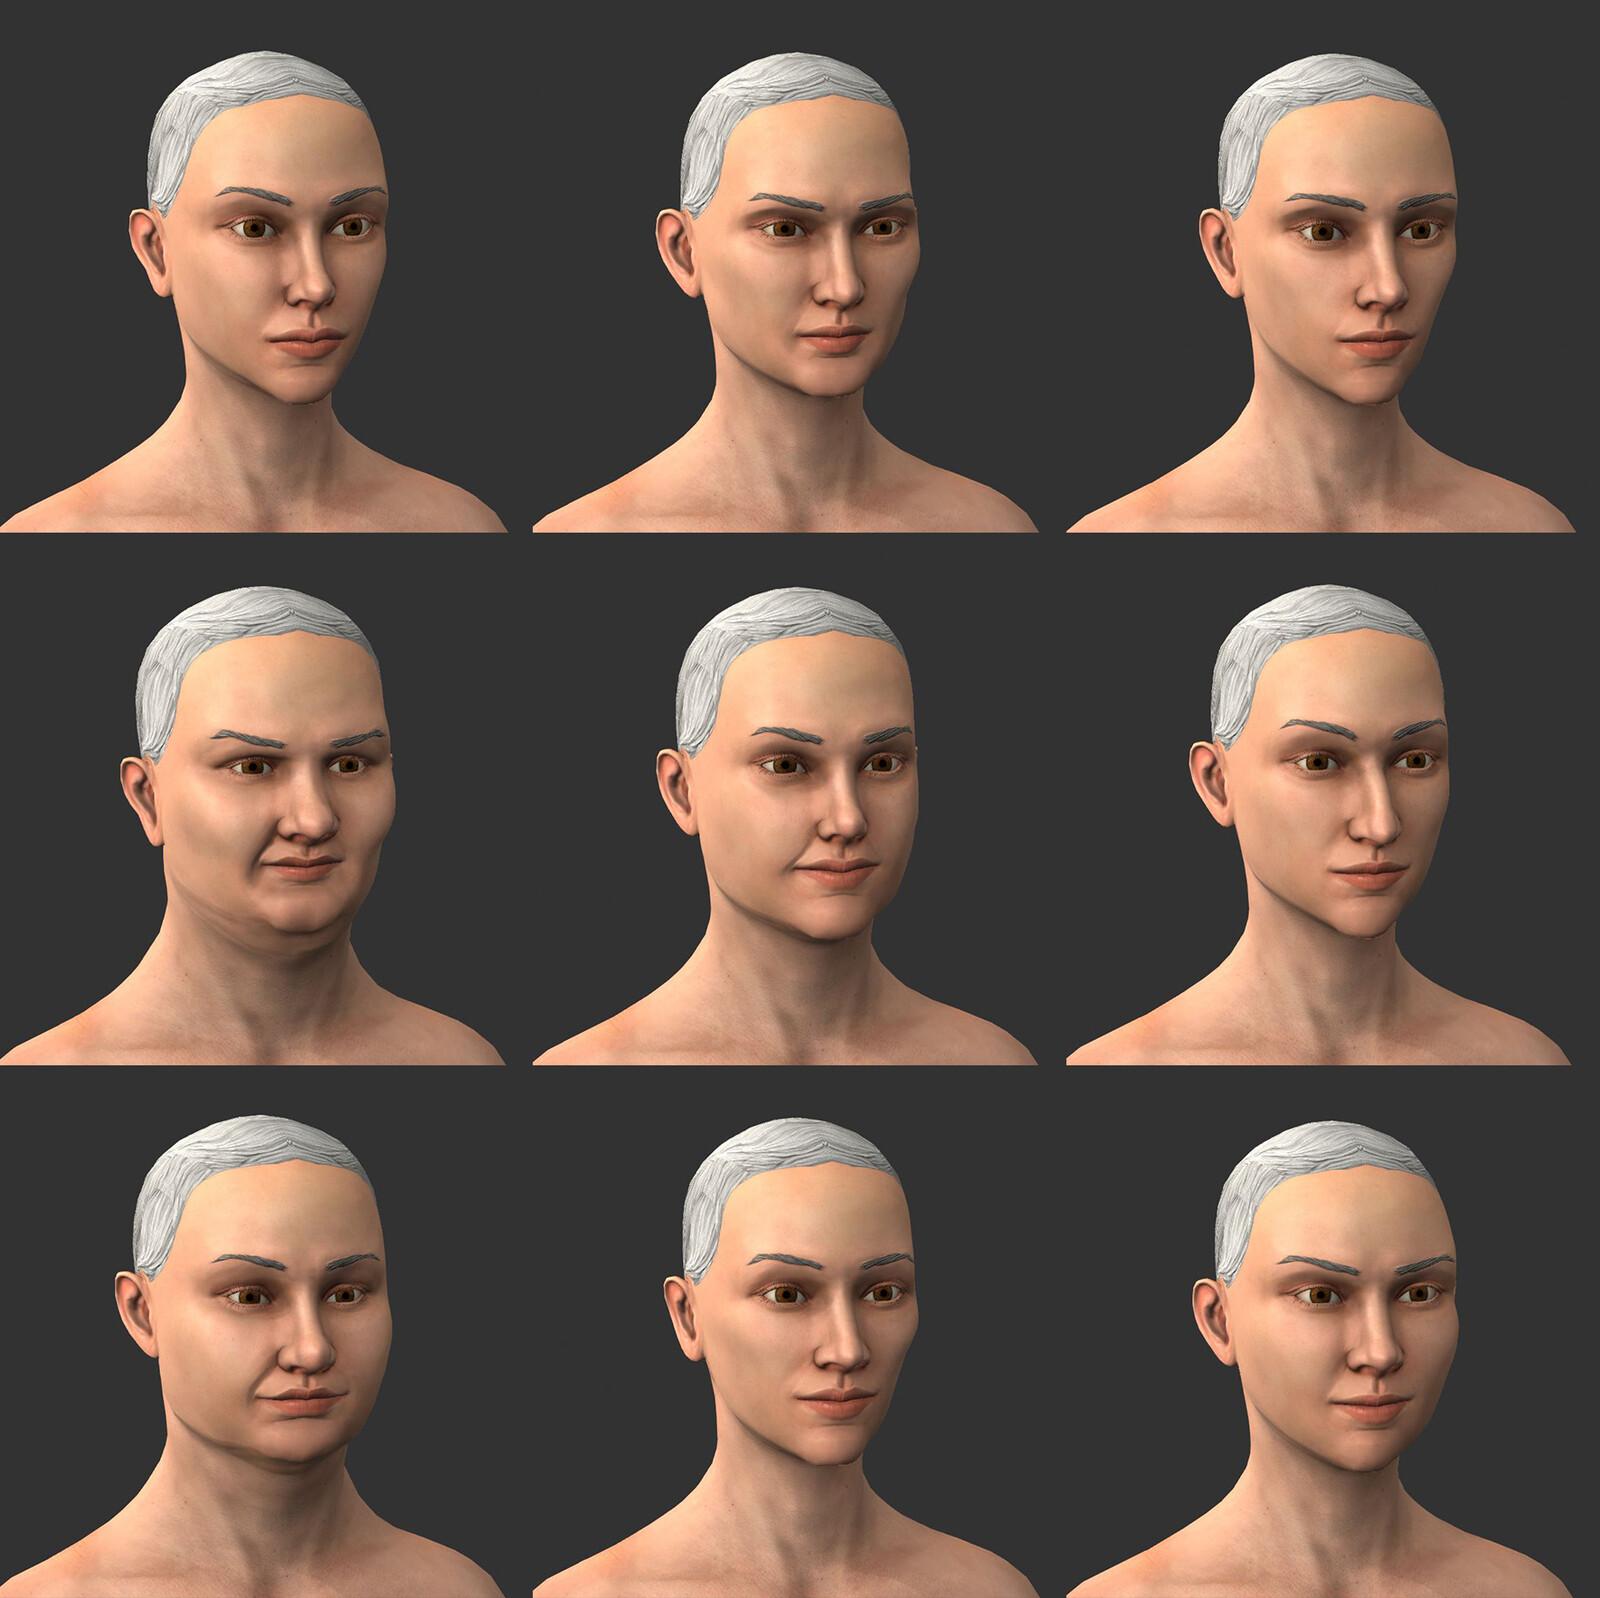 Woman Head Variations